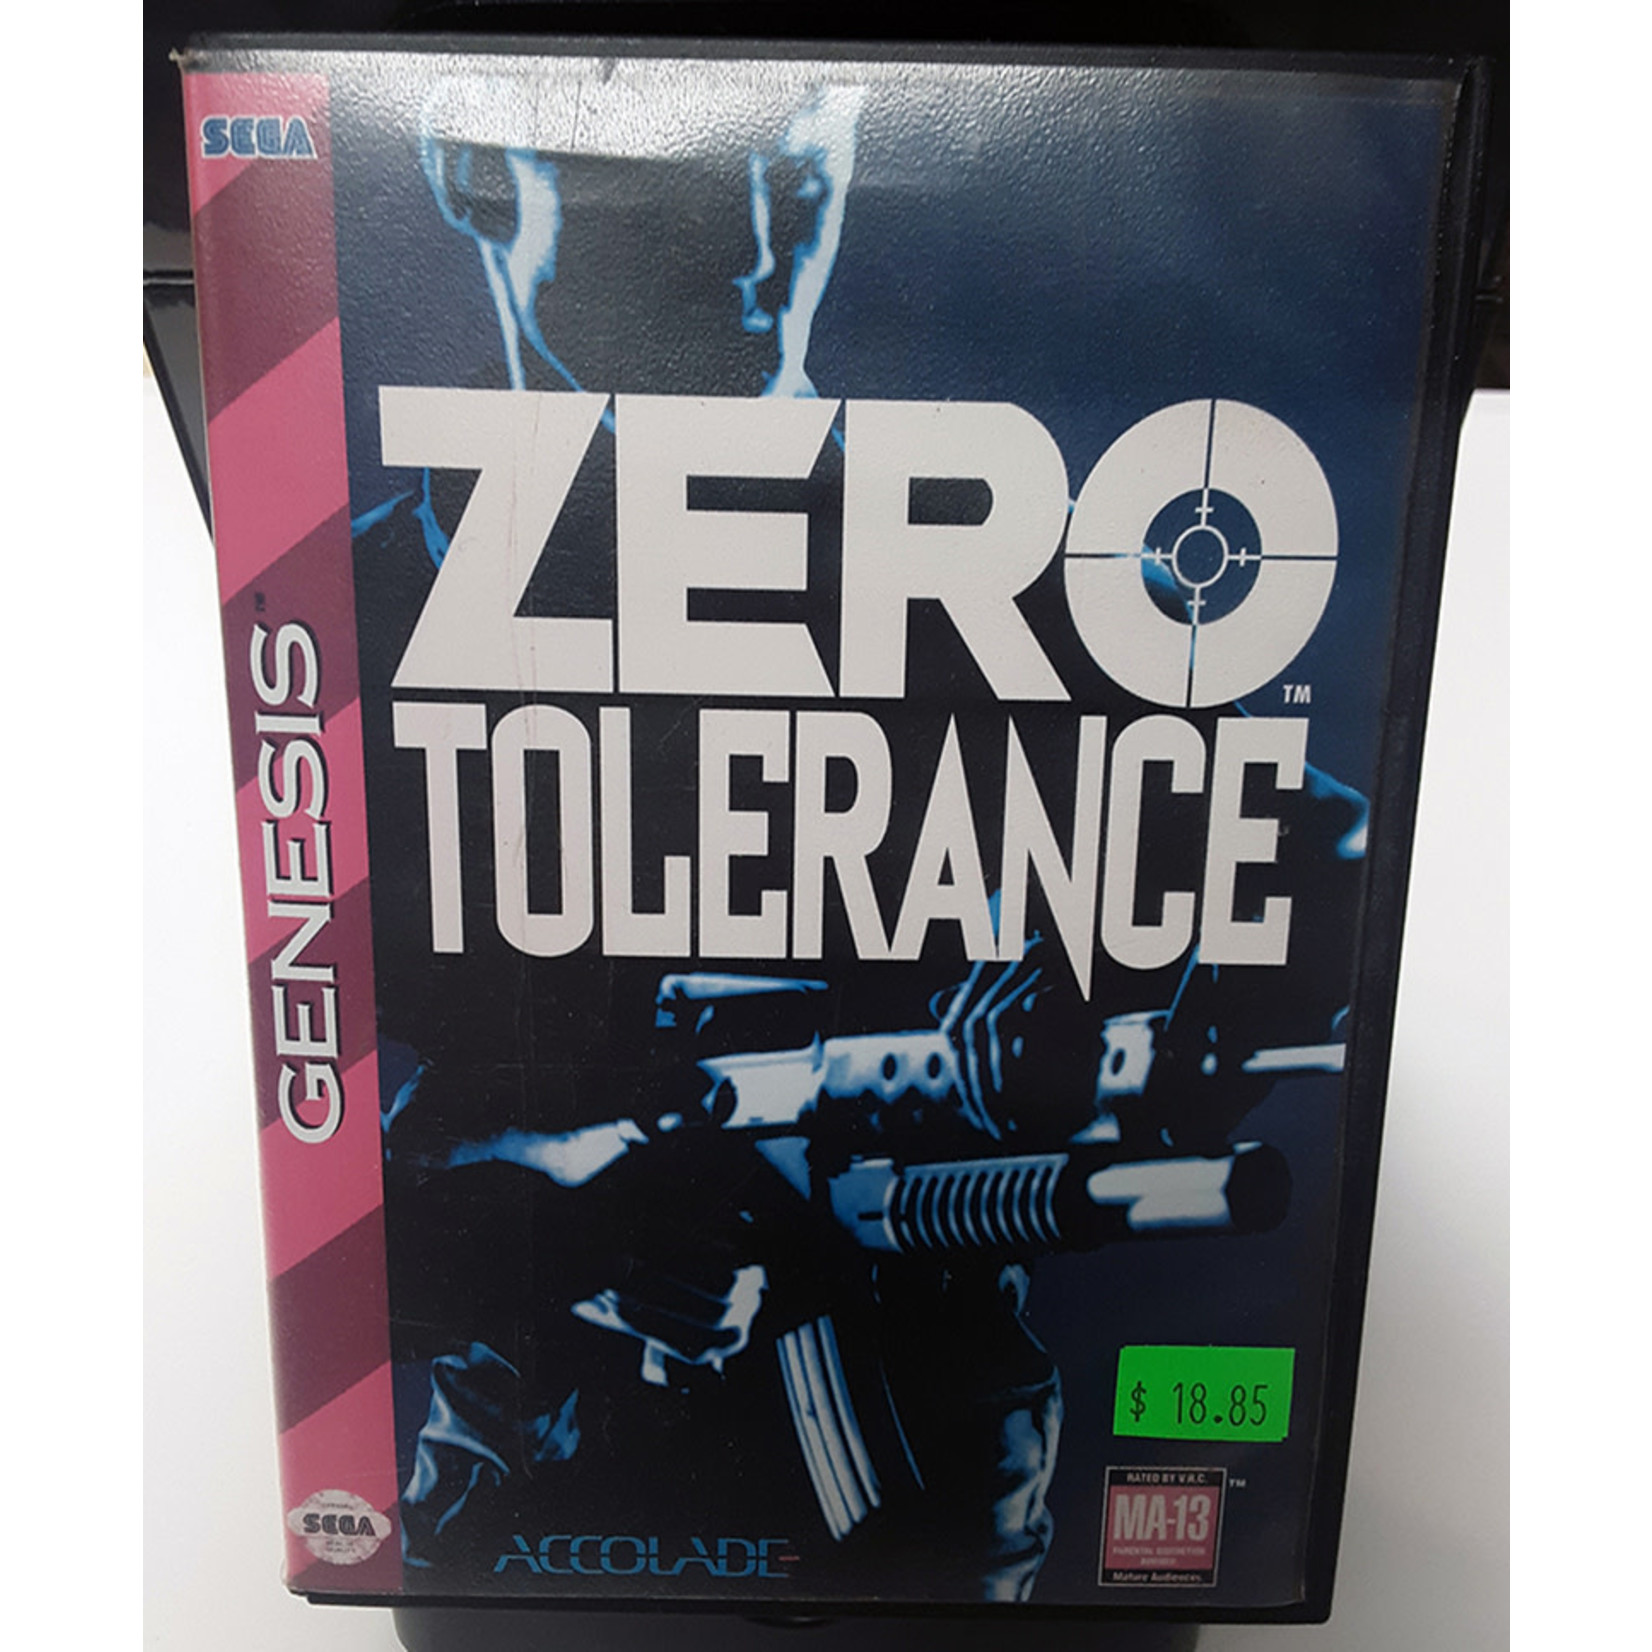 sgu-Zero Tolerance (in box)